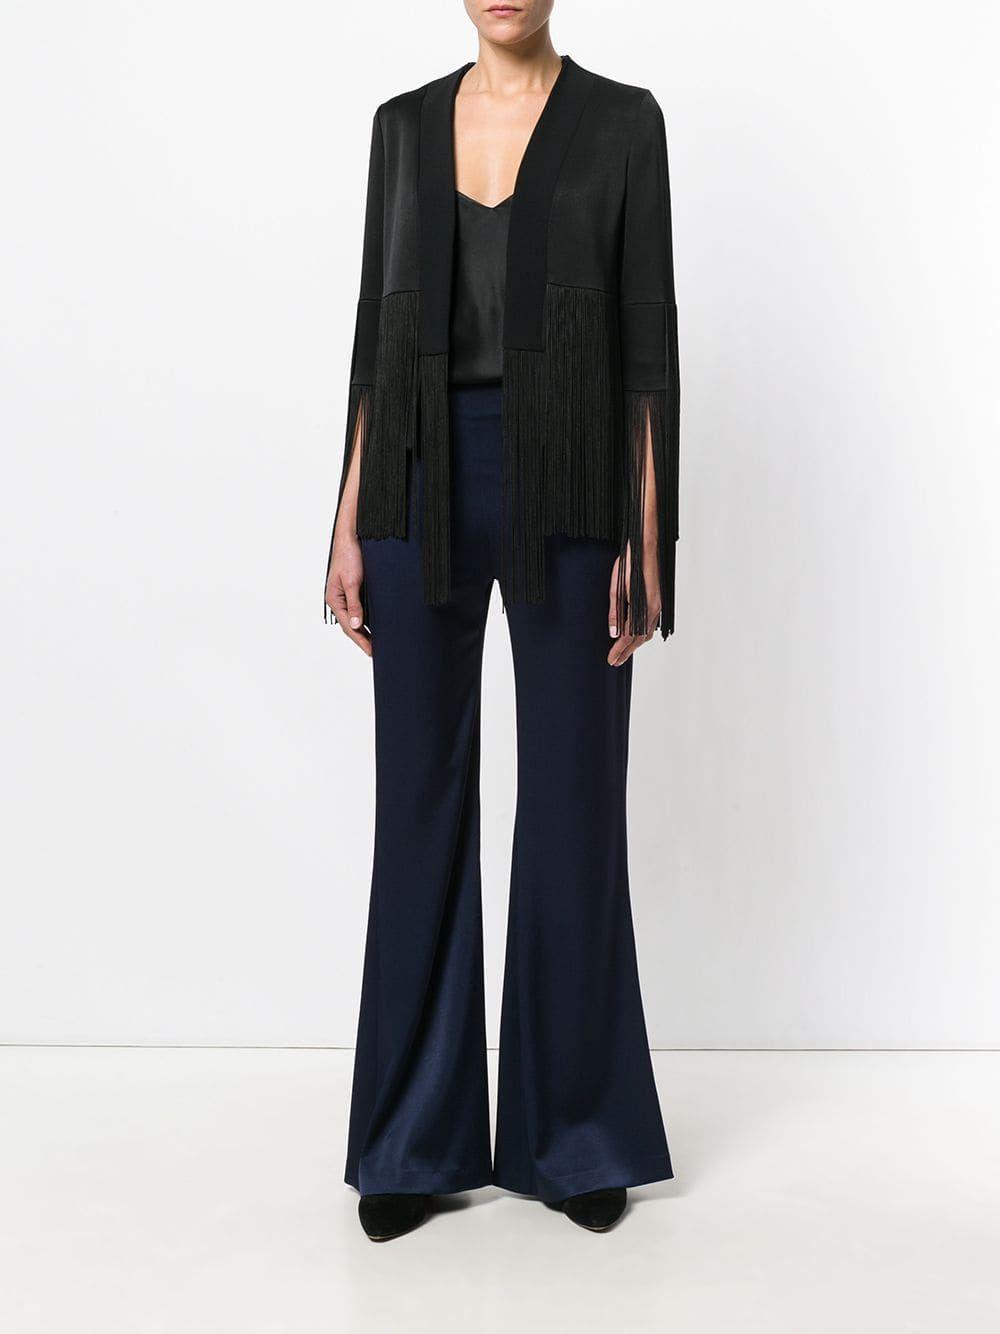 Galvan, A london fashion week favorite in 2020 | Fashion